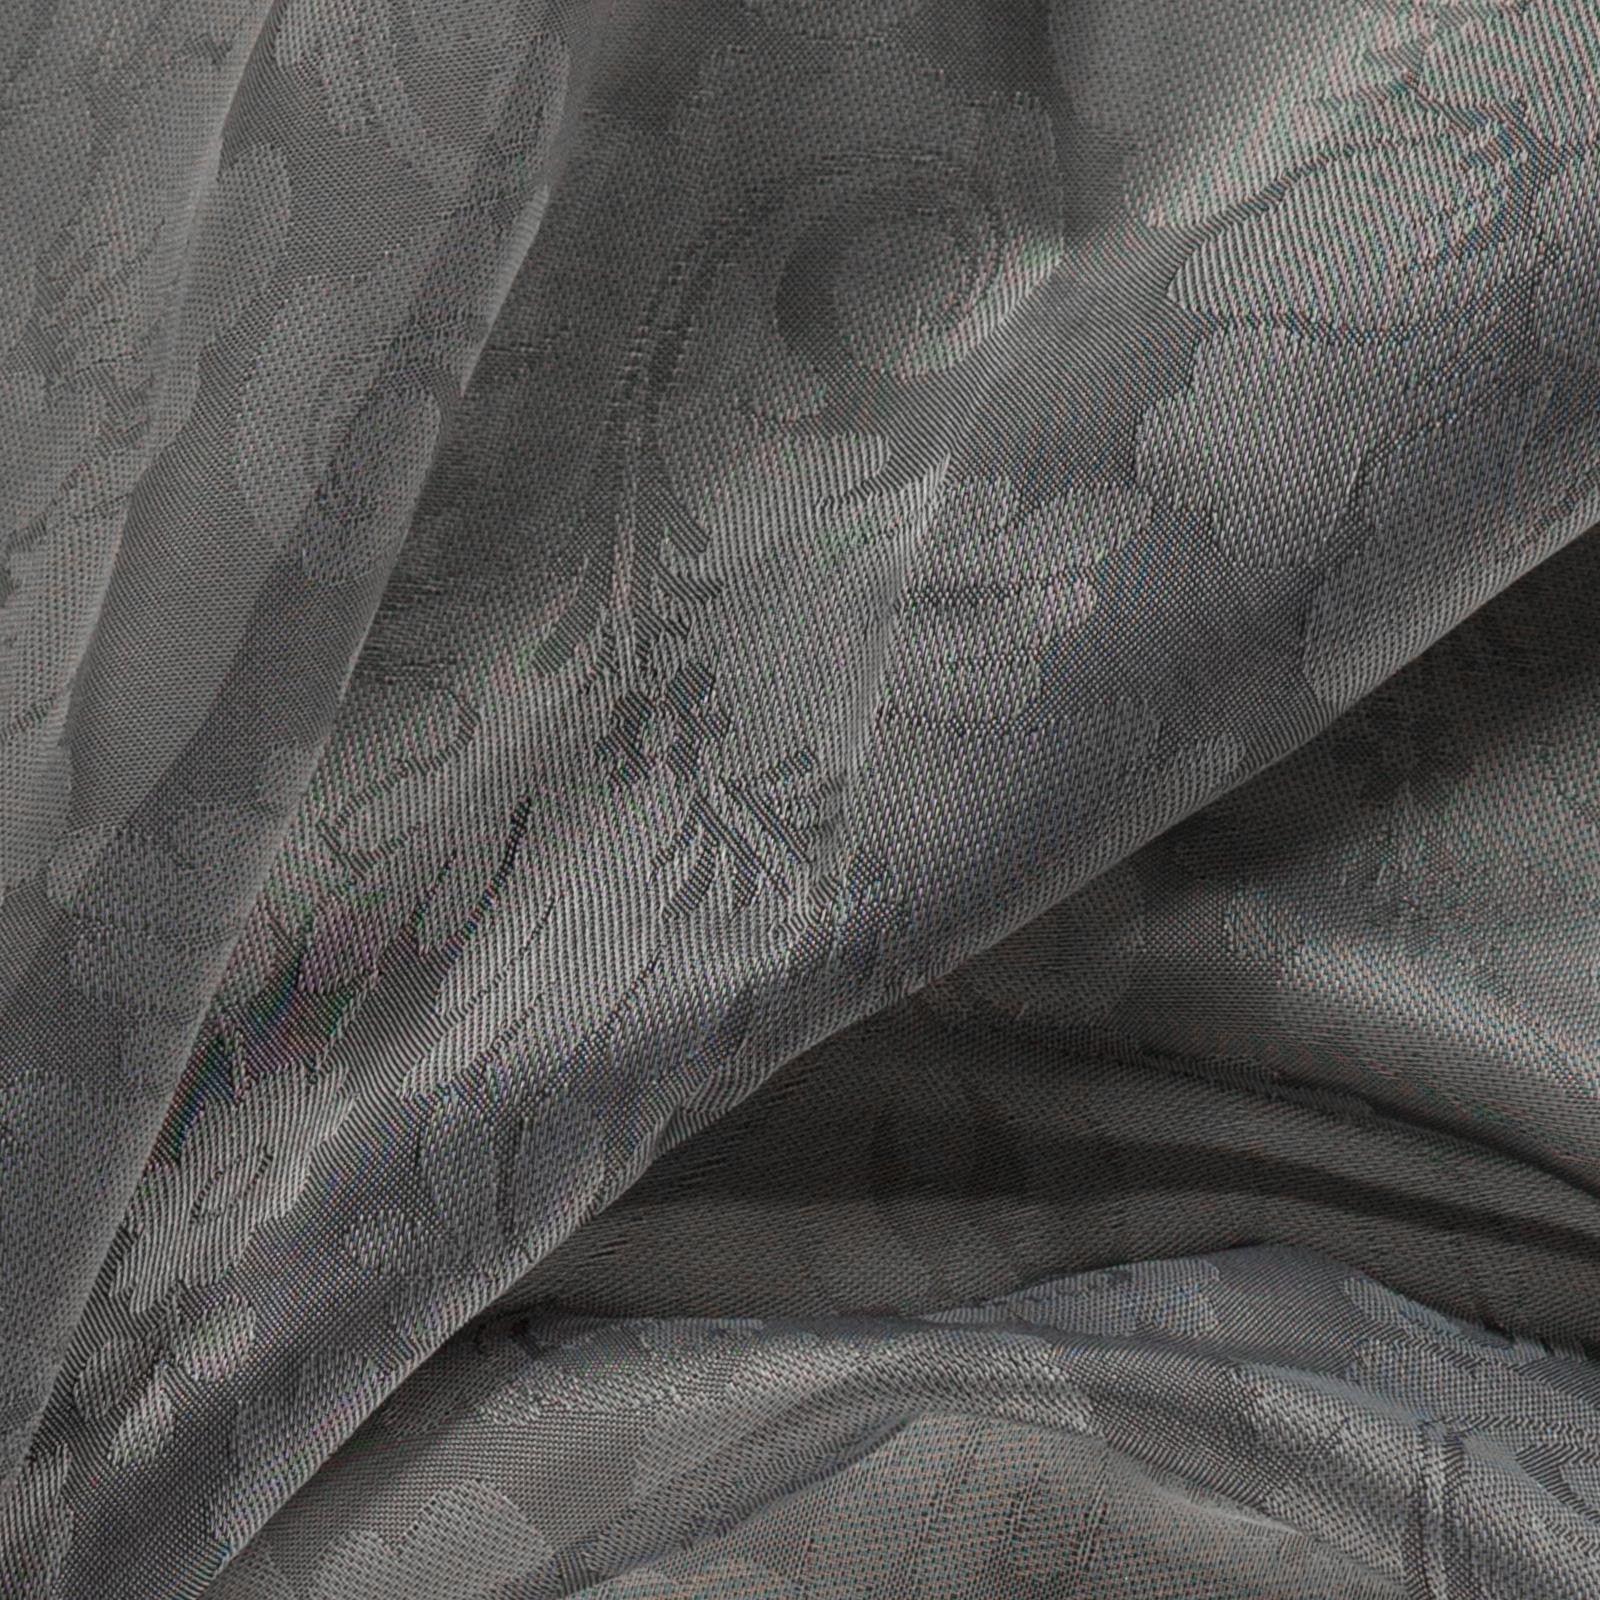 tissu damass lavable pour rideaux levin by more fabrics. Black Bedroom Furniture Sets. Home Design Ideas